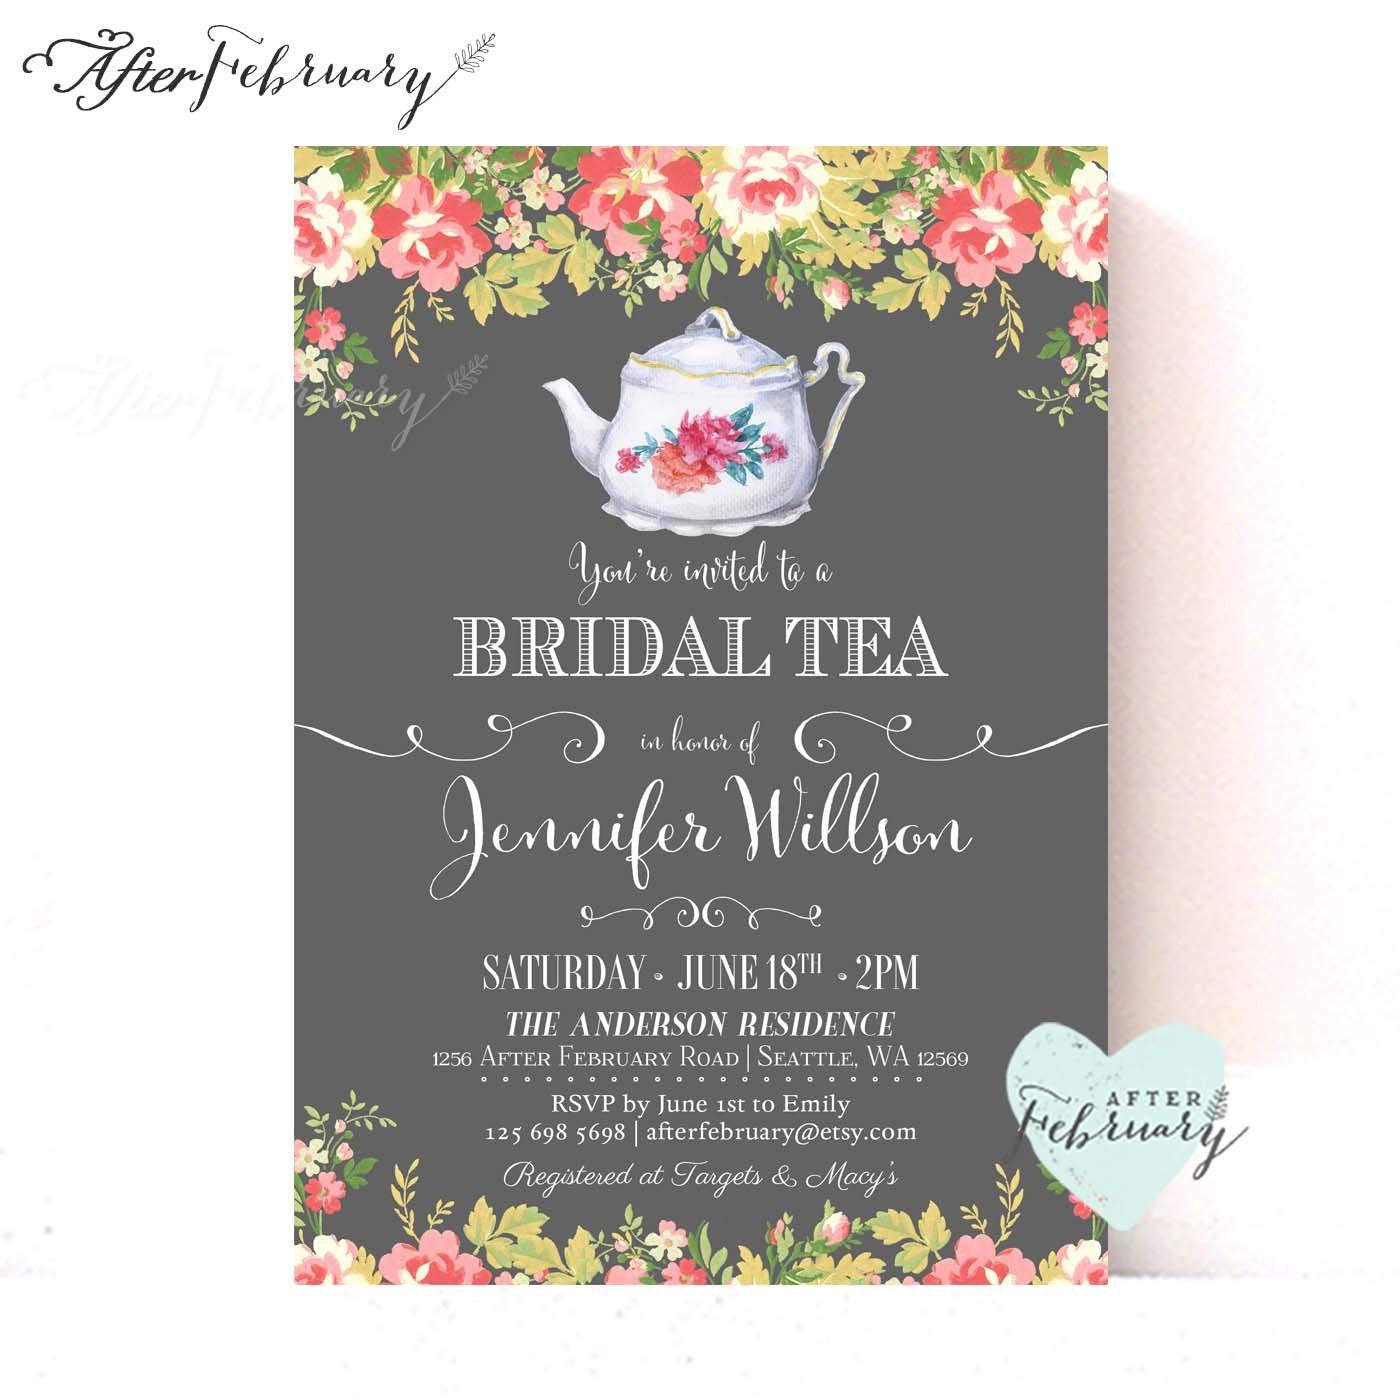 Bridal Shower Tea Party Invitations // Bridal Shower Tea Party